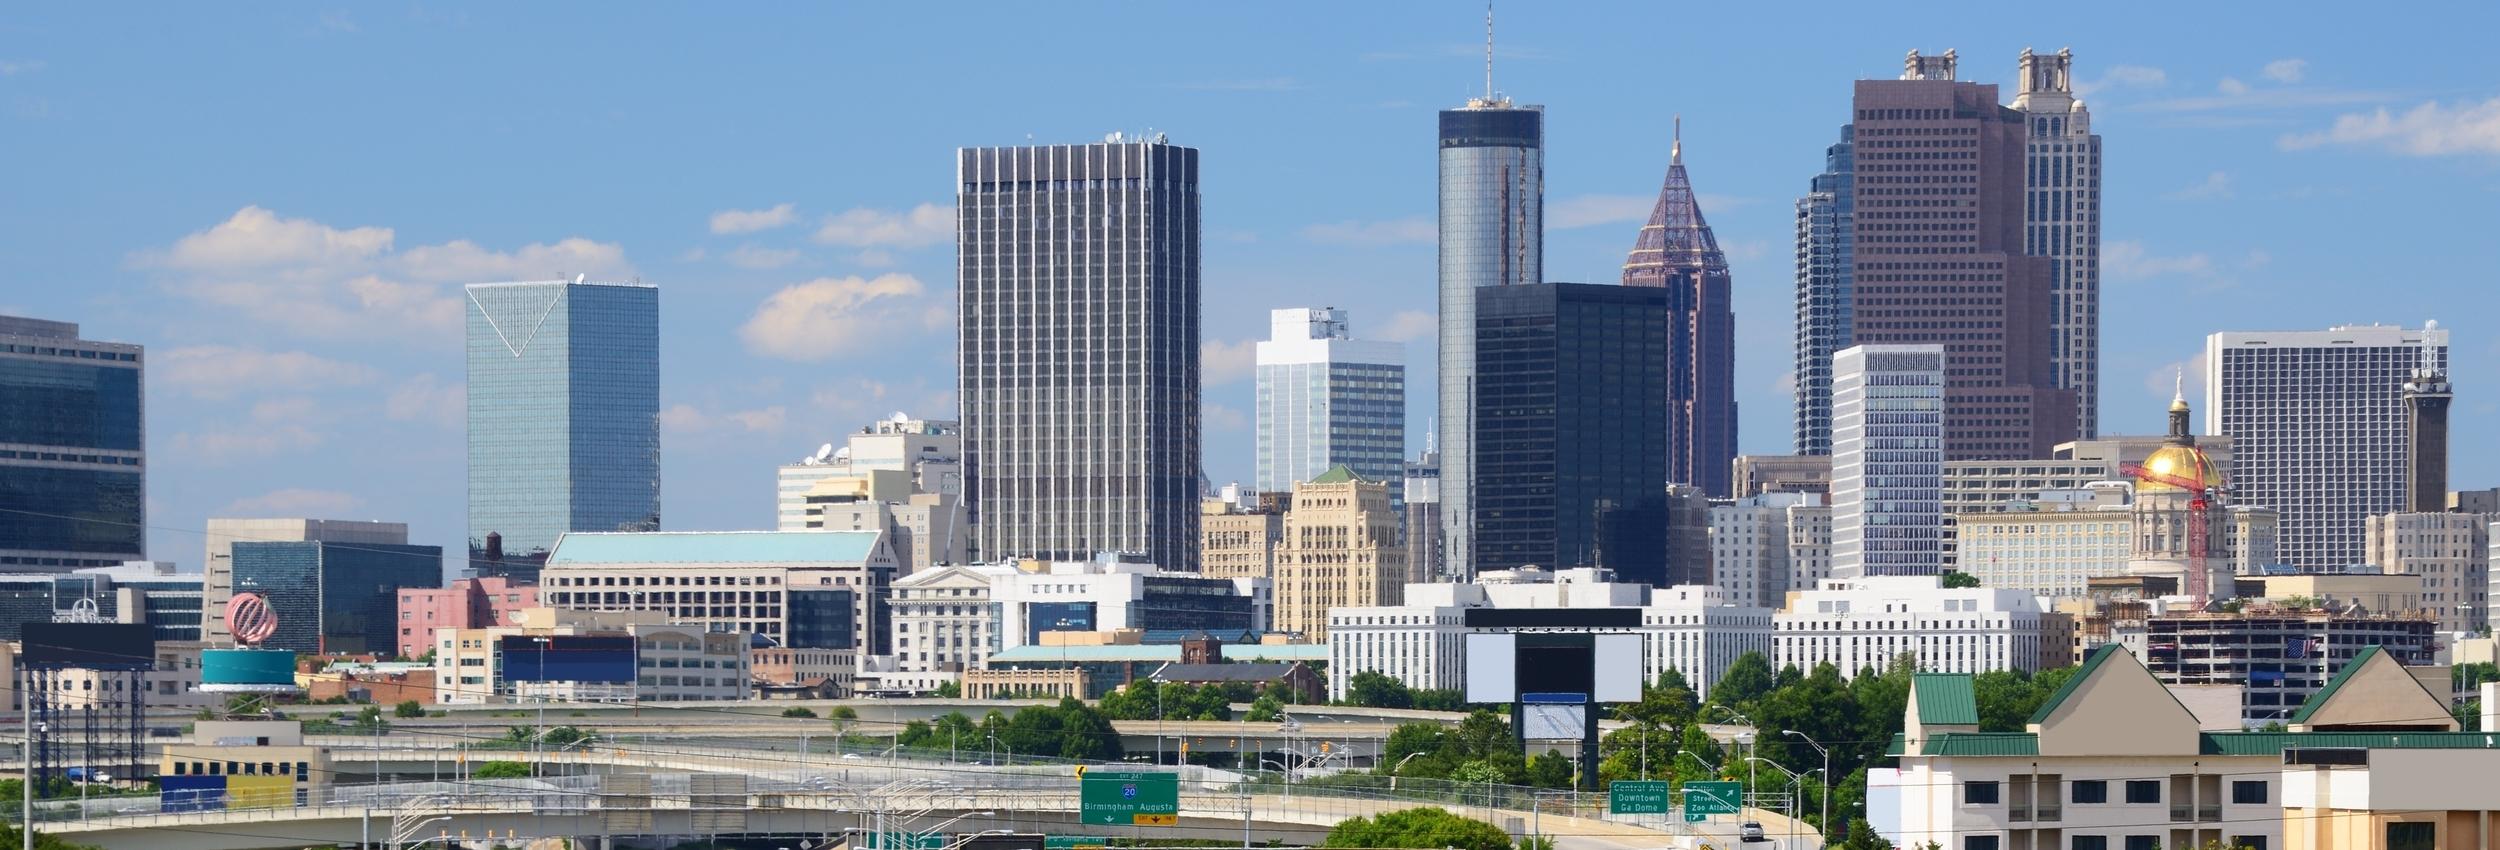 tronix Engineering, About, company, city of Atlanta, atronixengineering.com